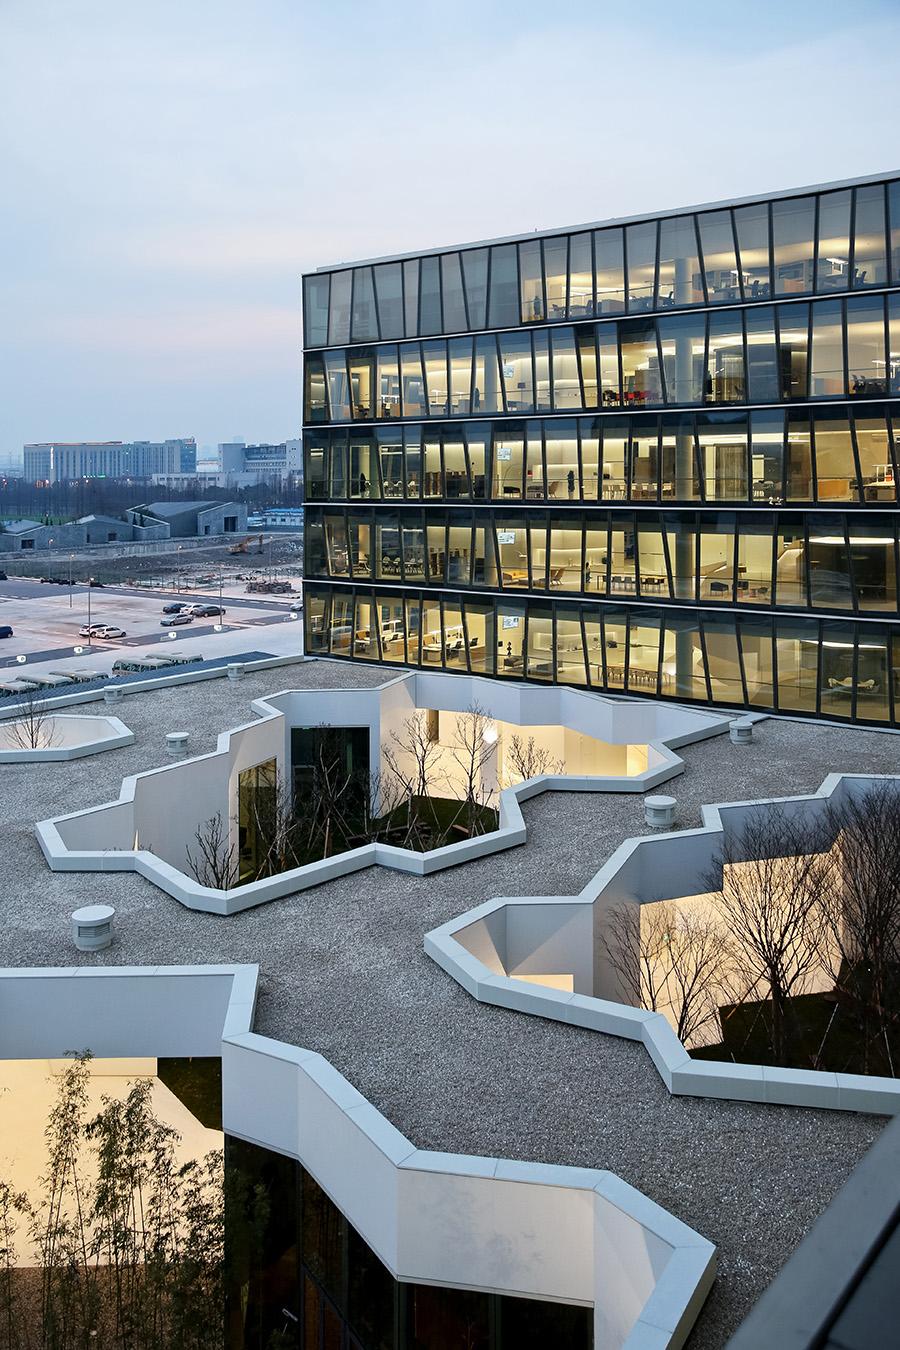 Image courtesy of ZAO/Zhang_Ke-Novartis Office Building